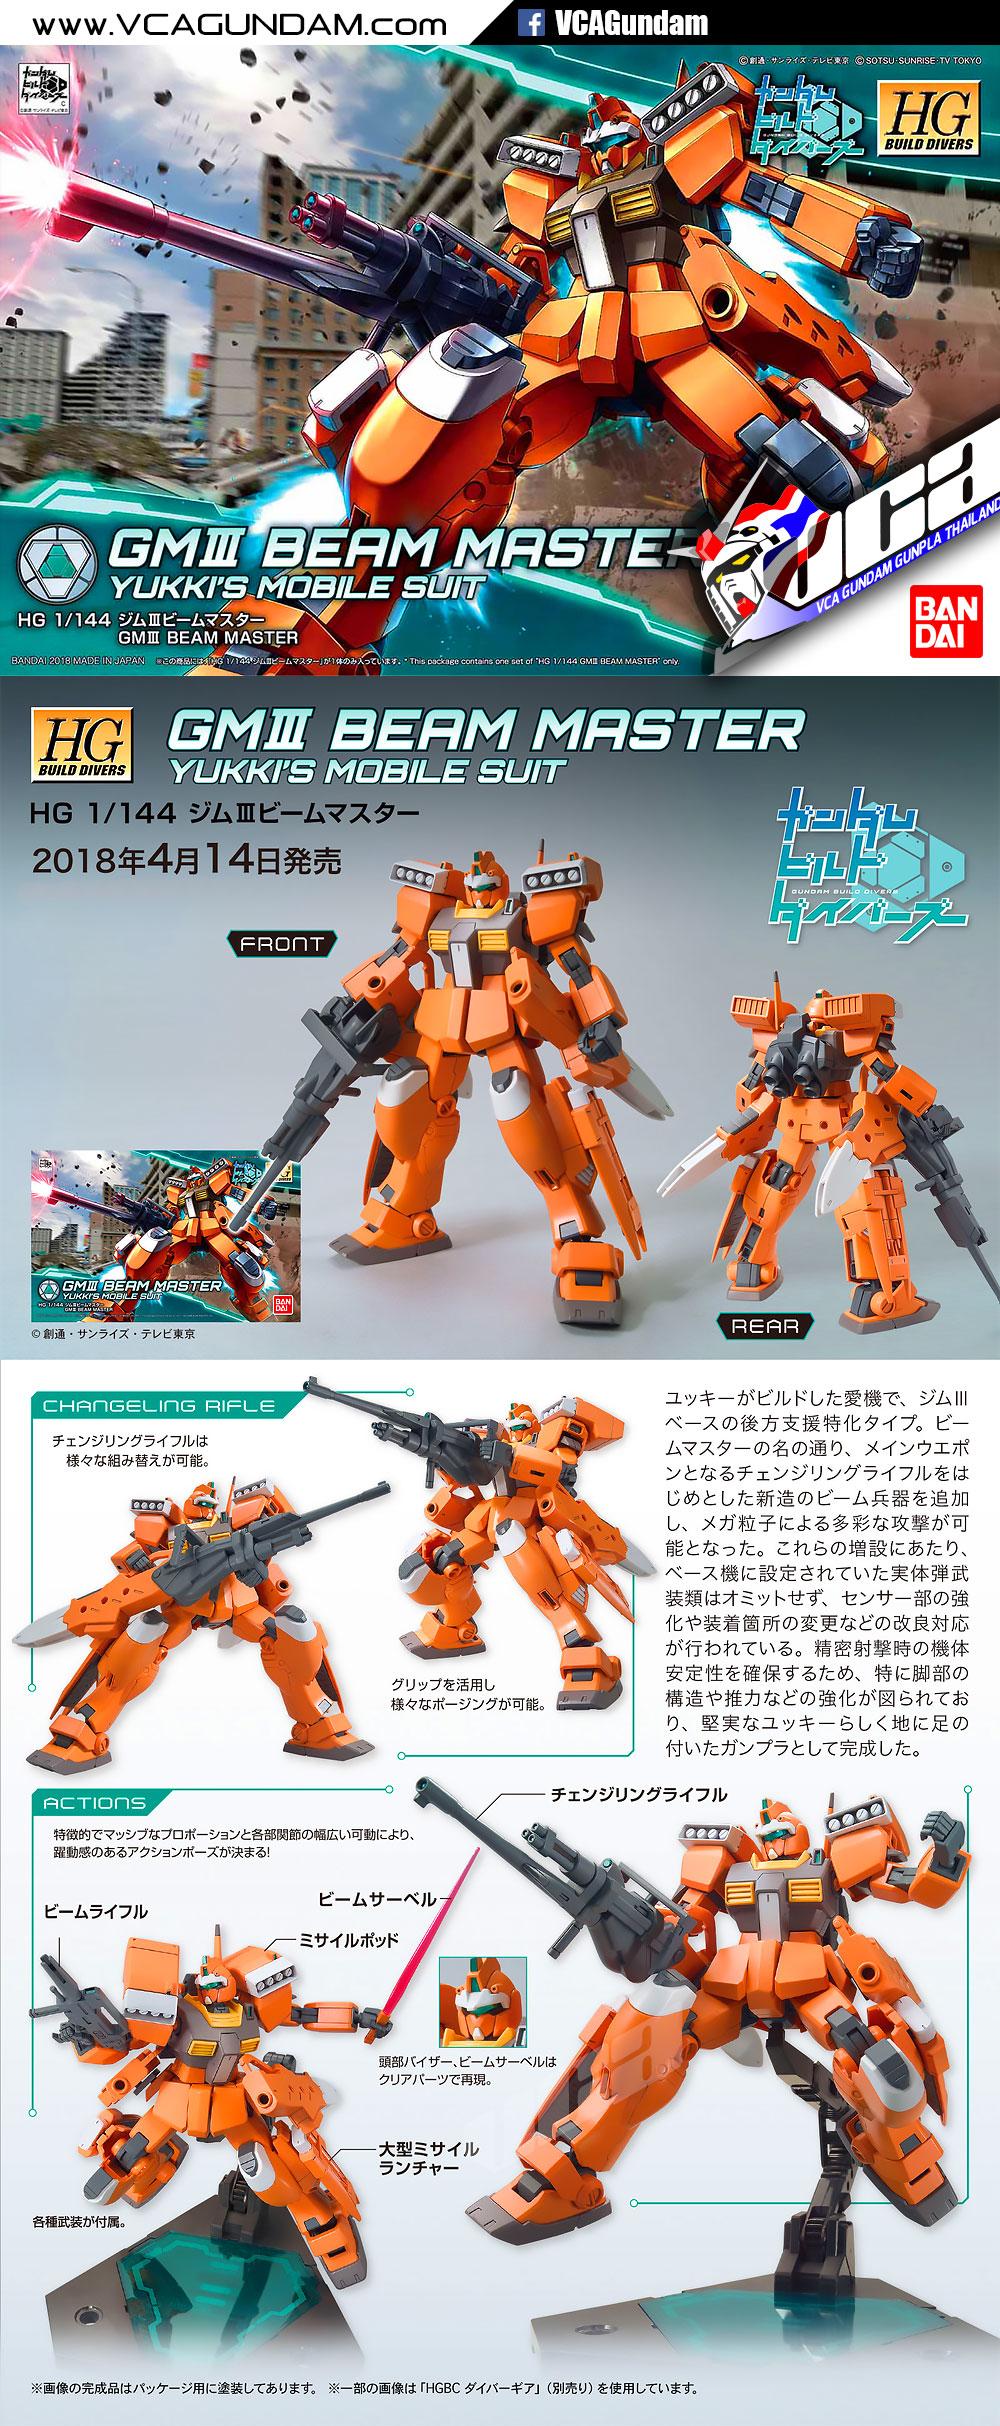 HG GM III BEAM MASTER GM III บีม มาสเตอร์